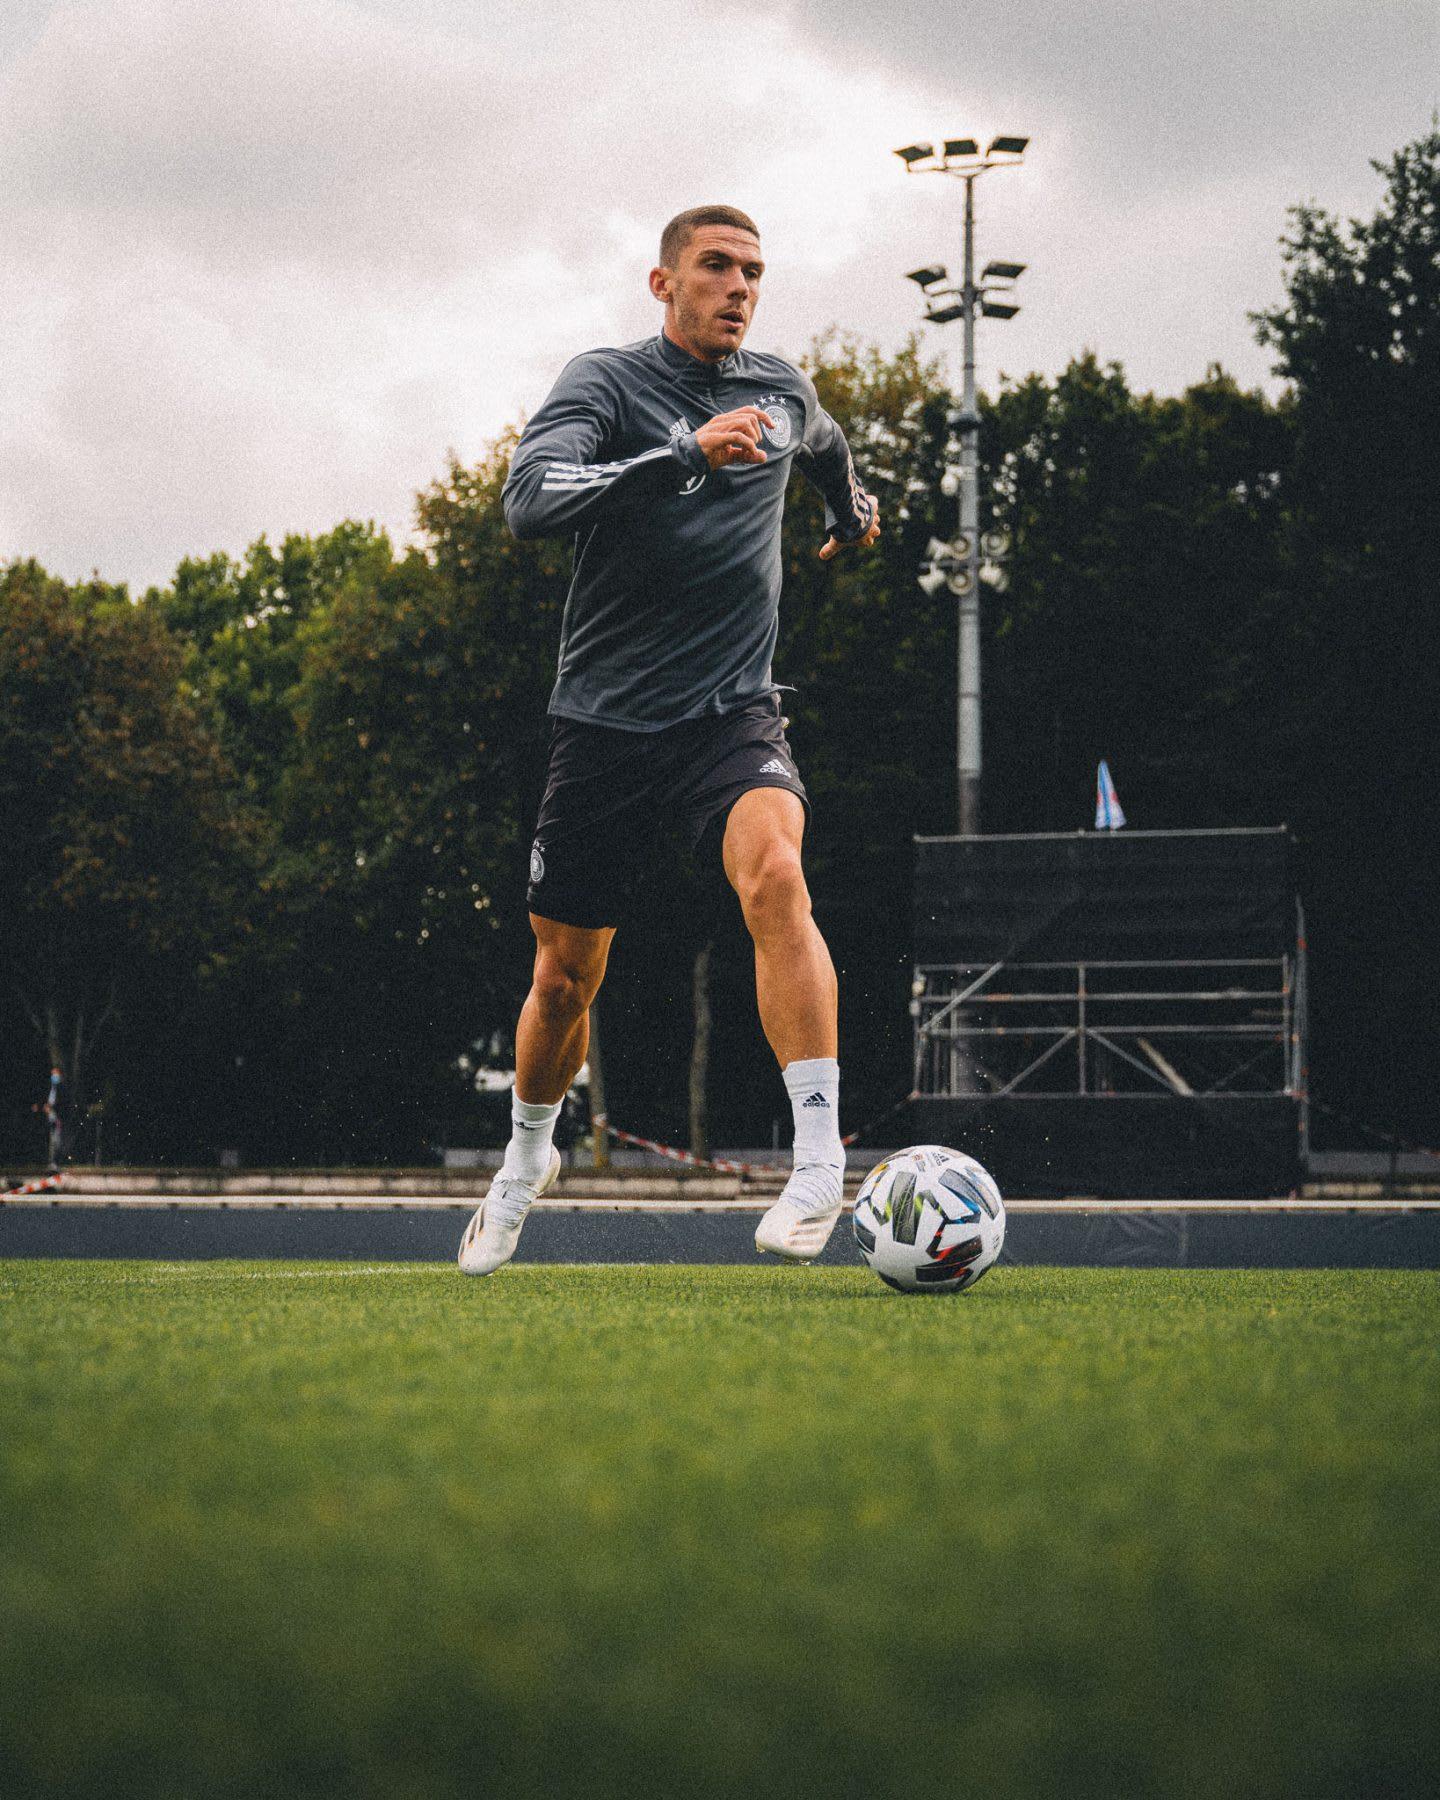 Caucasian man running and kicking a footballer on a grassy pitch, Robin Gosens, footballer, football, German, Germany, team, adidas, sports, exercise, DFB